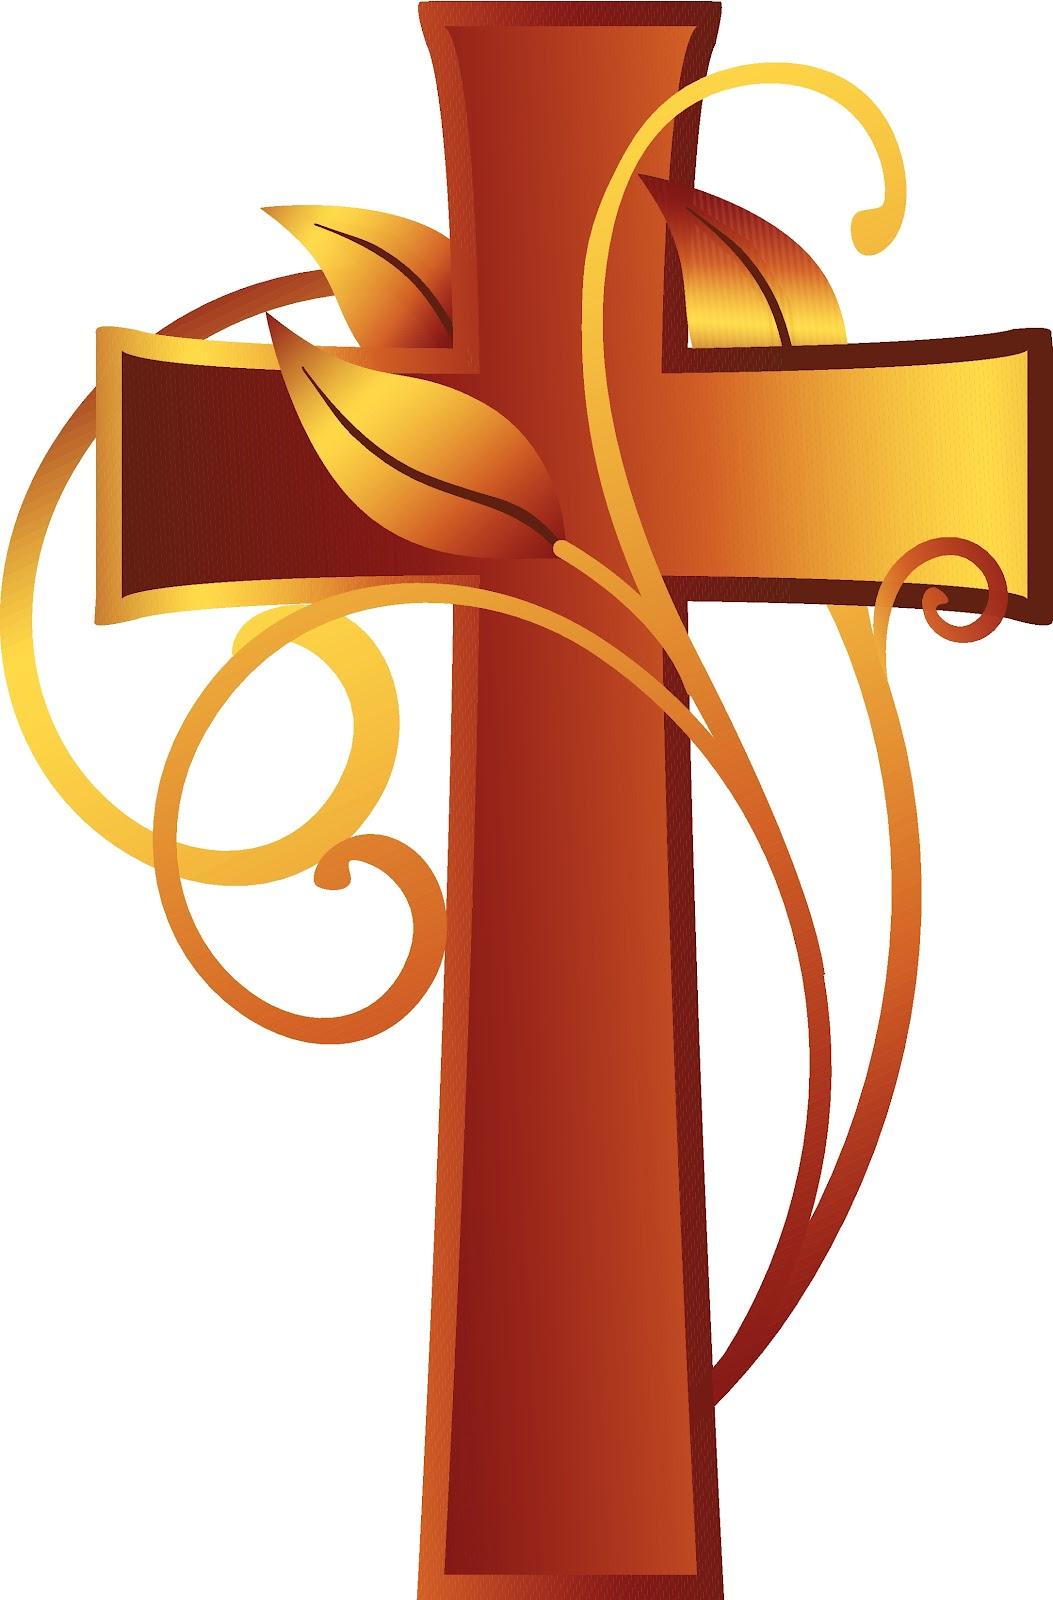 For Catholic Mass Clipart .-For Catholic Mass Clipart .-13